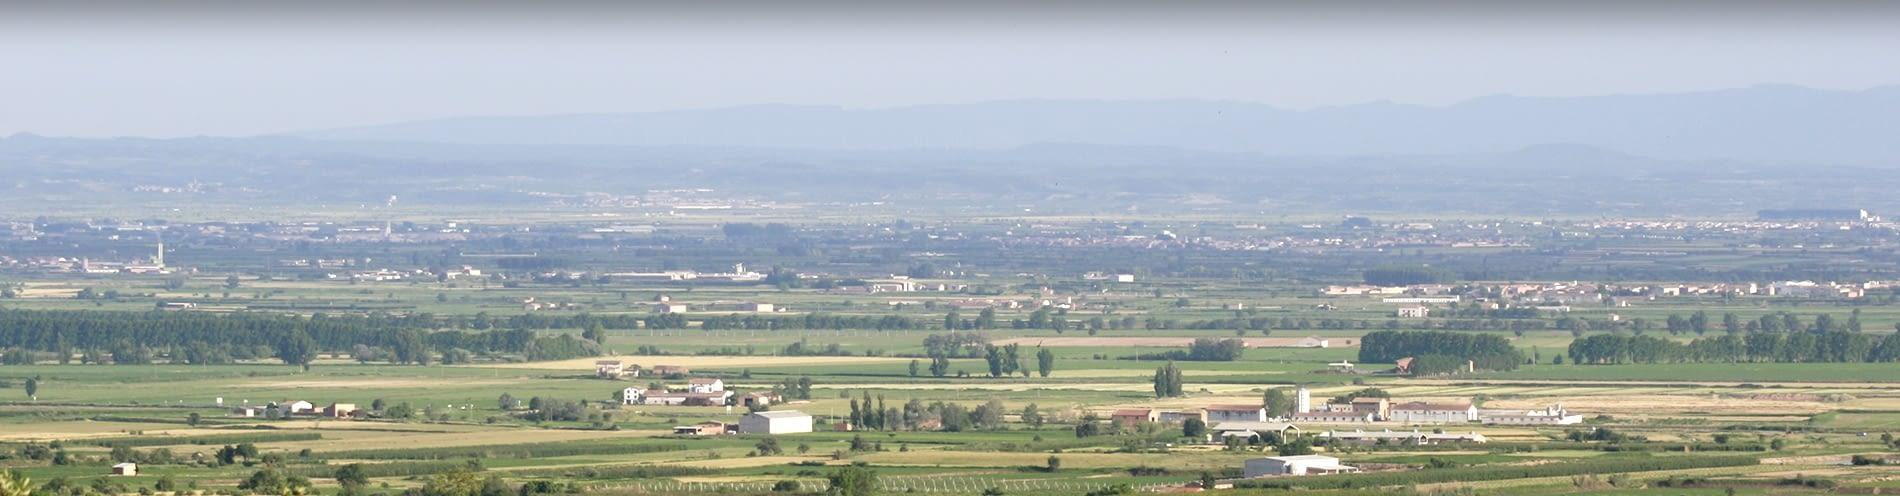 Urgell_3